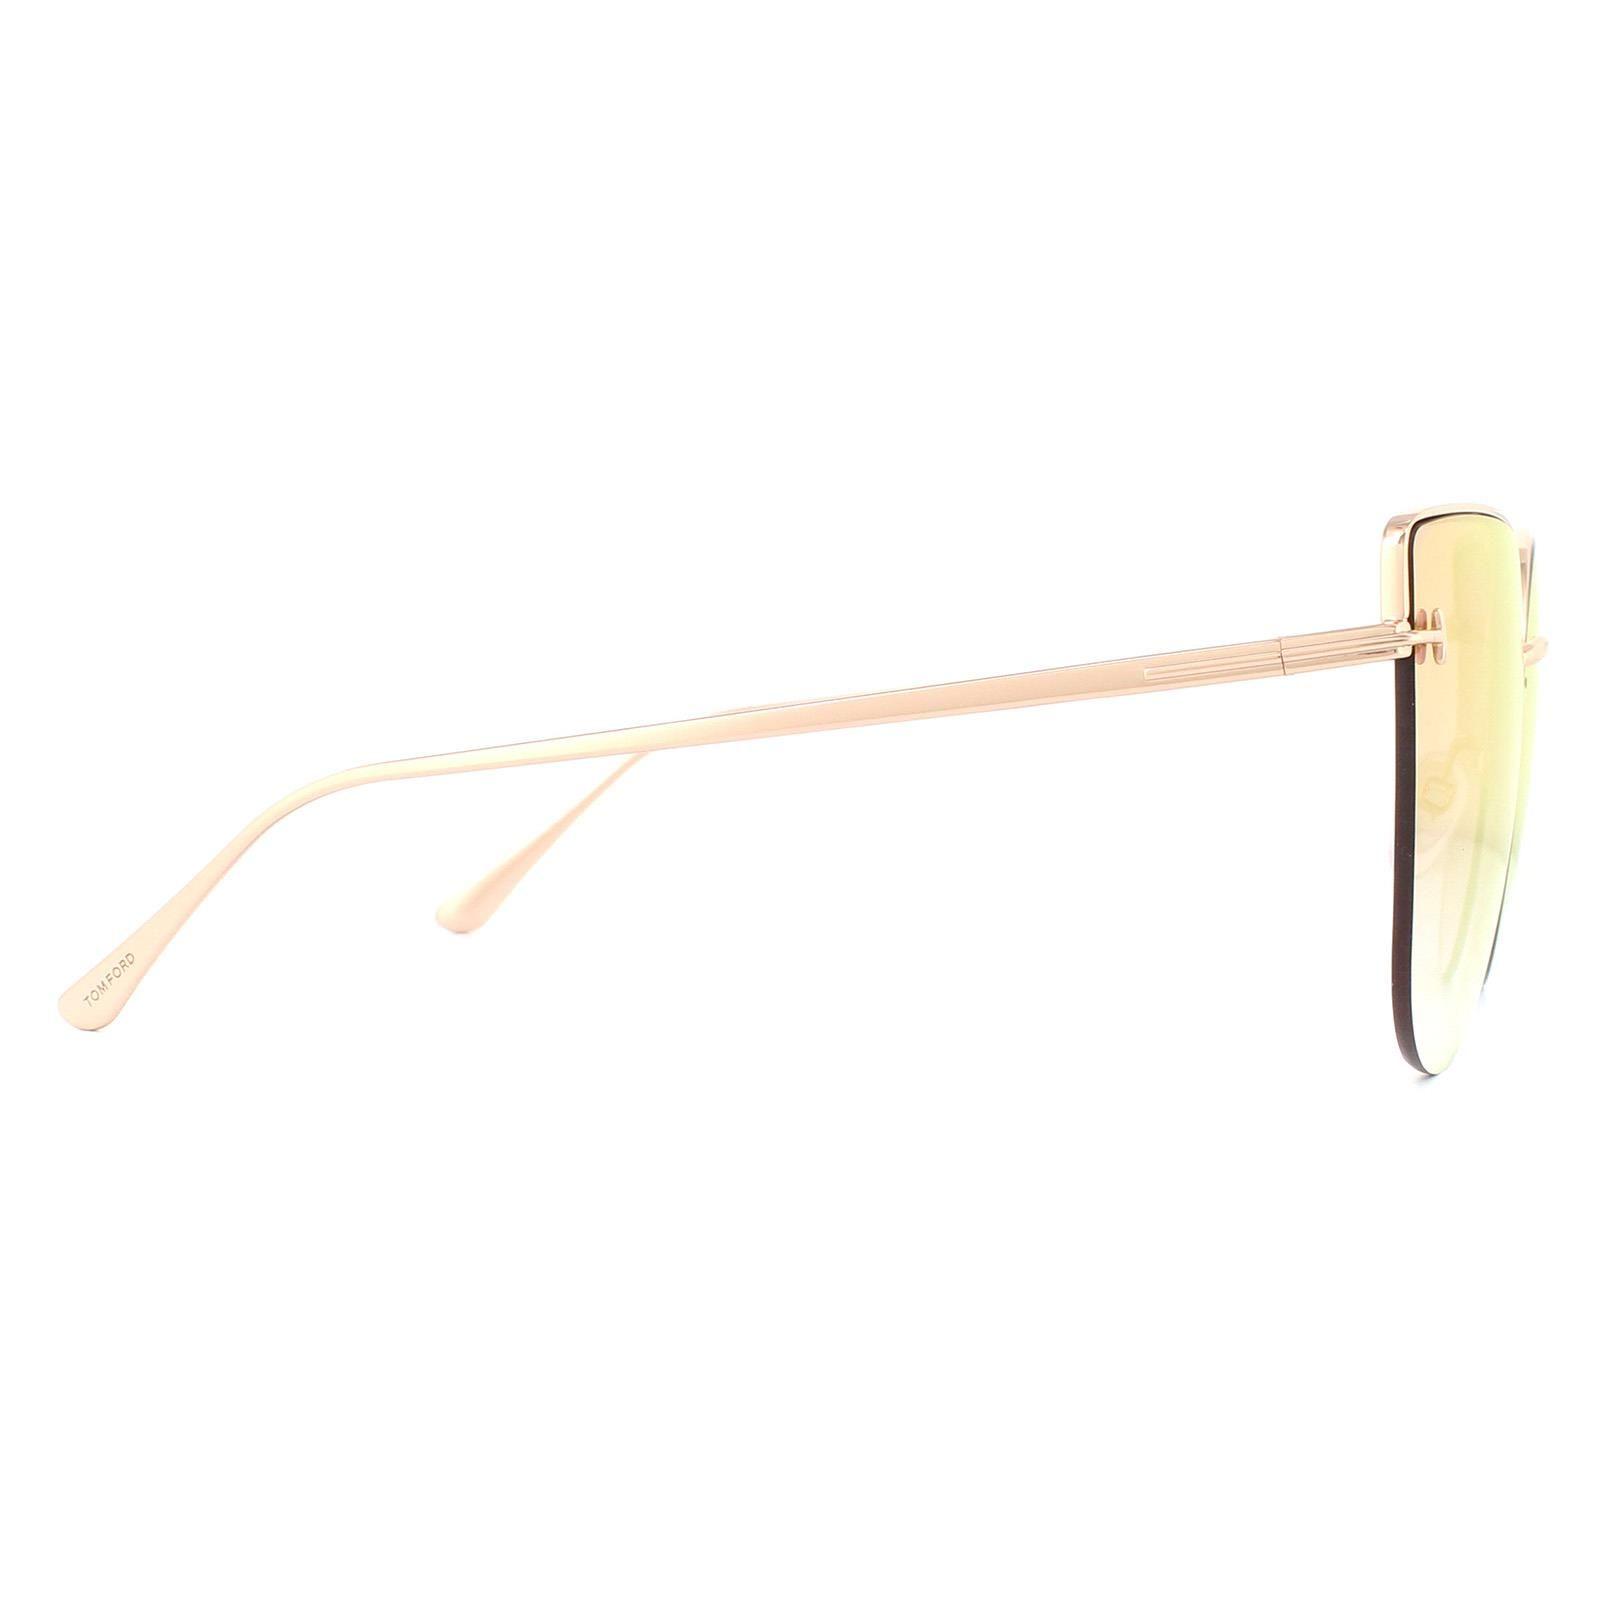 Tom Ford Sunglasses Ingrid-02 FT0652 33Z Gold Pink Purple Gradient Mirror